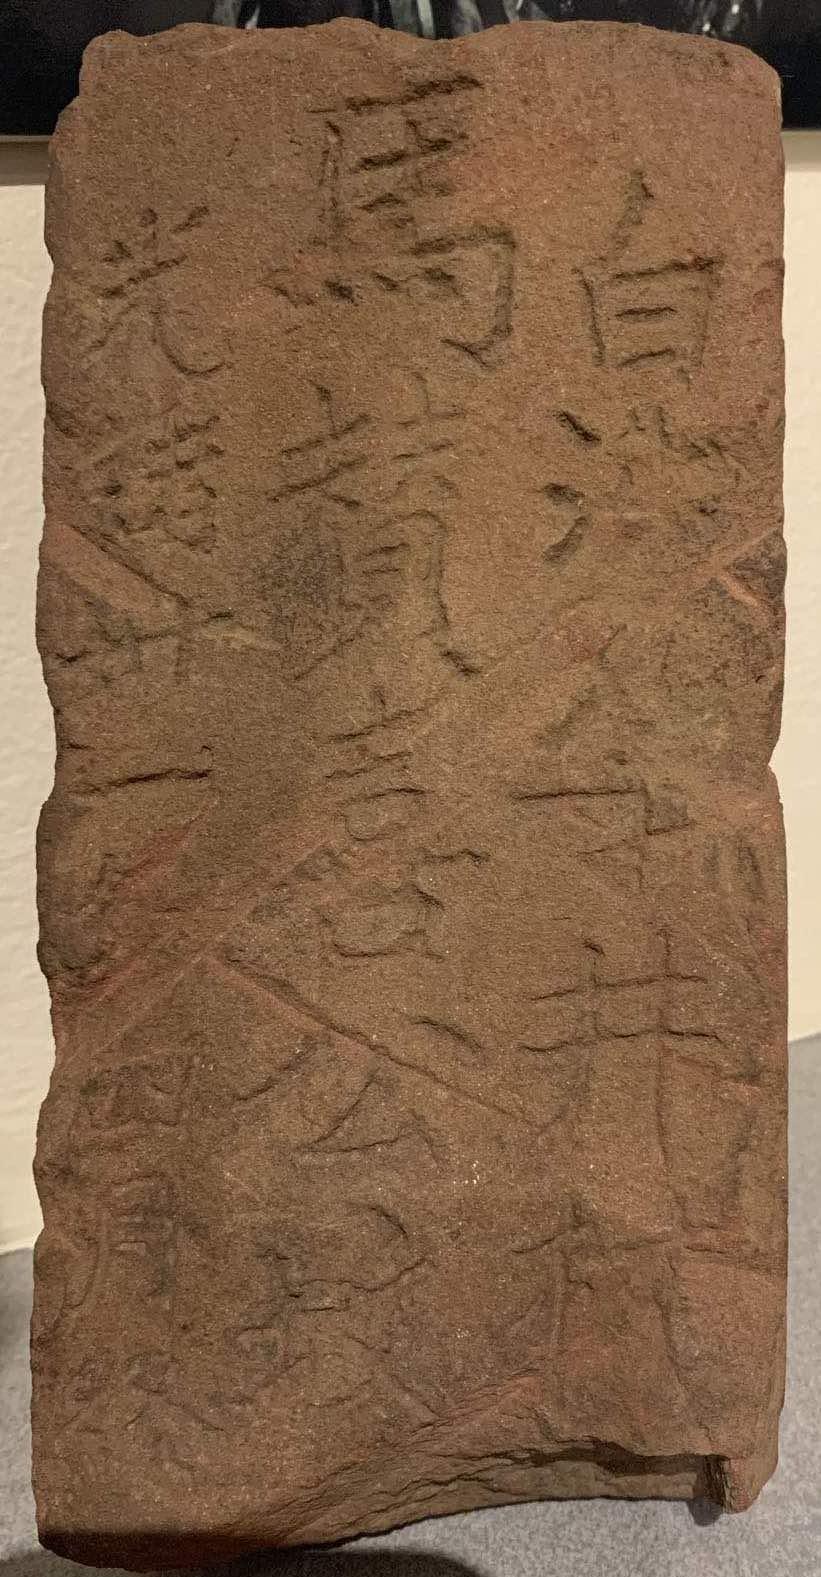 the grave brick copy